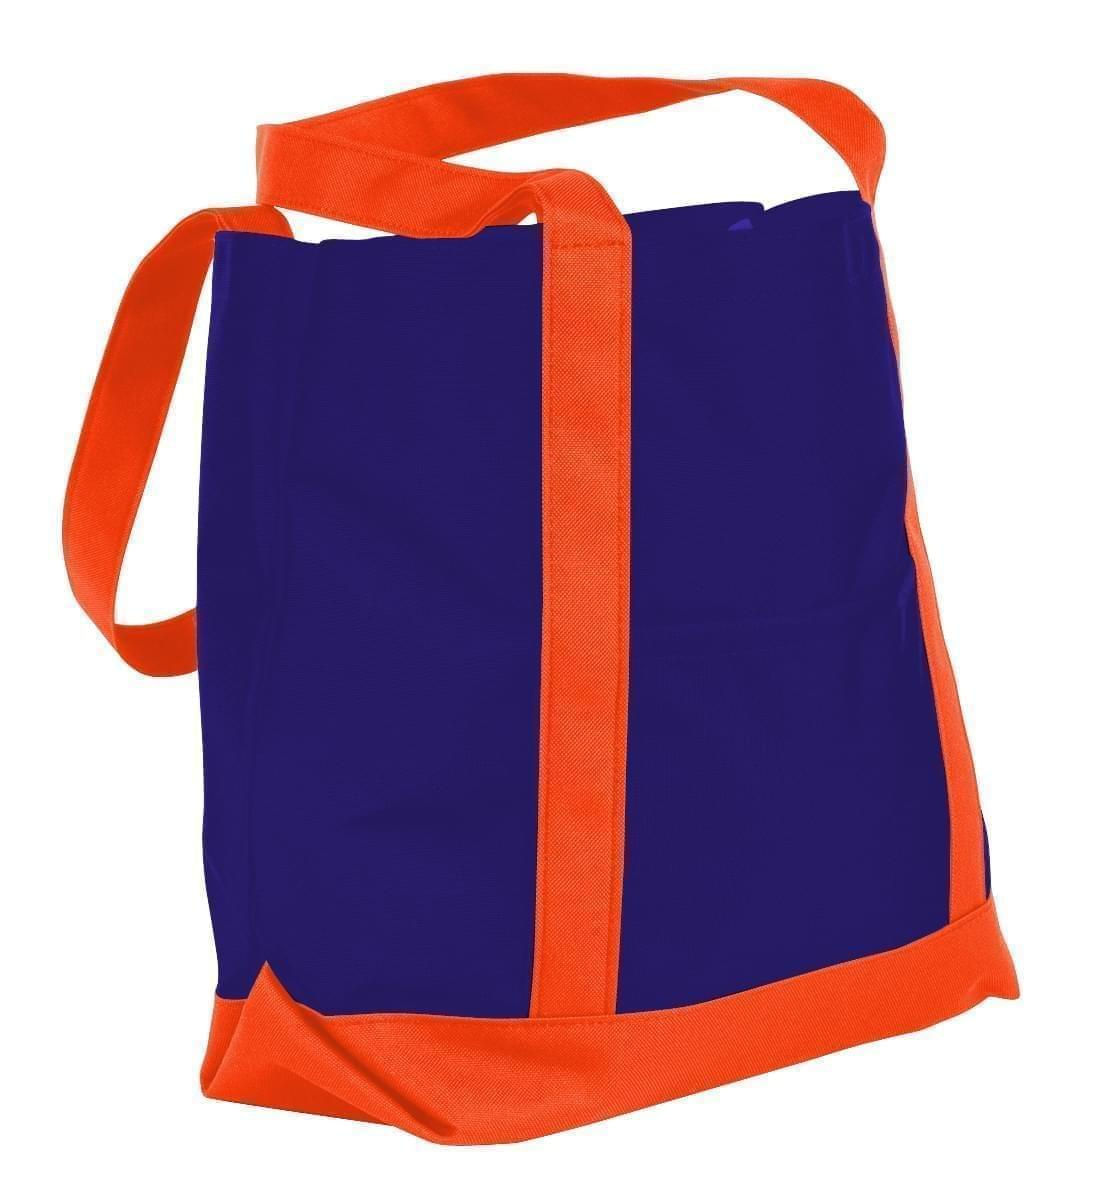 USA Made Nylon Poly Boat Tote Bags, Purple-Orange, XAACL1UAYJ